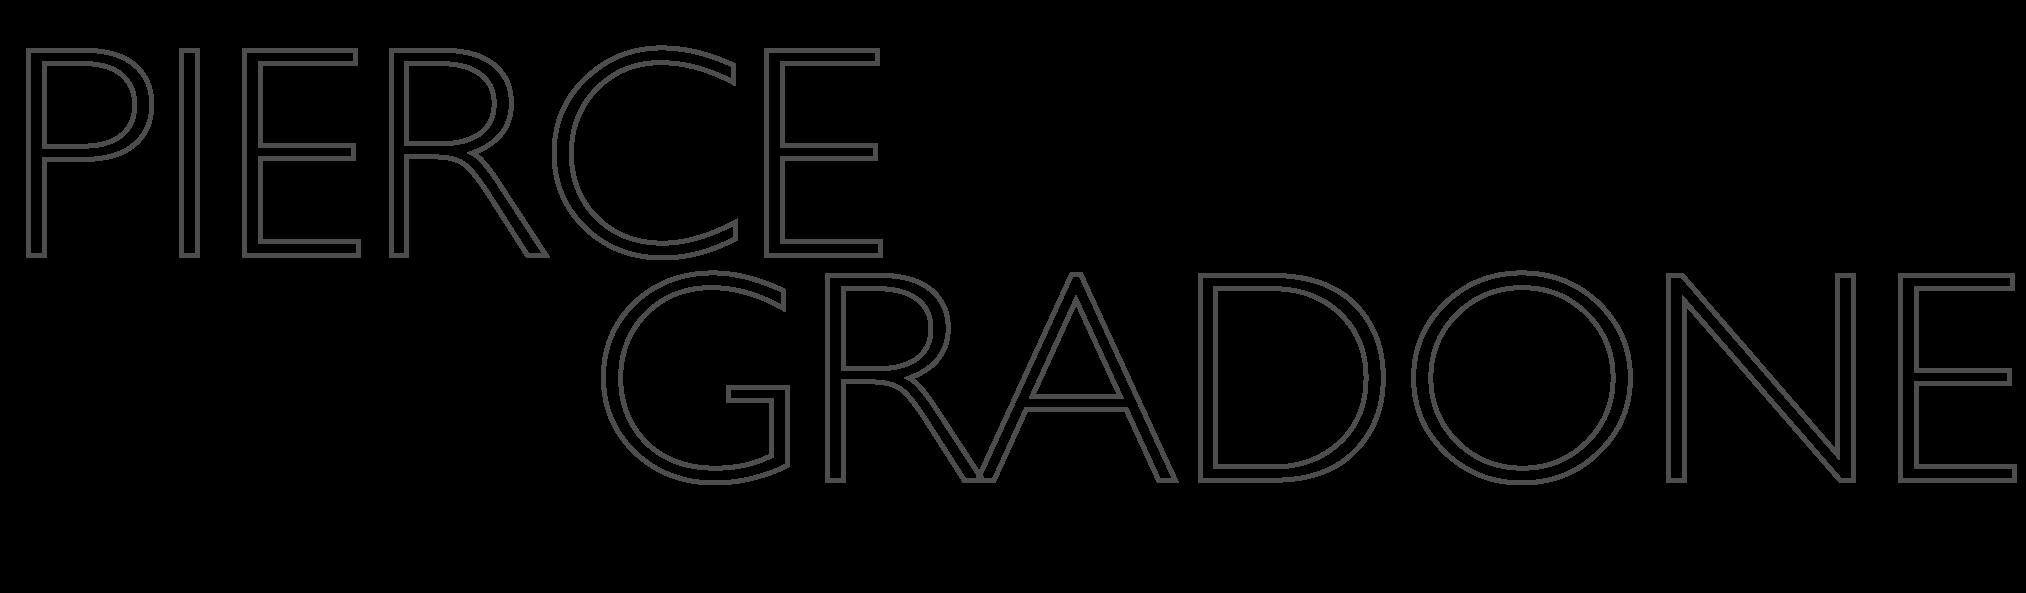 Pierce Gradone | composer